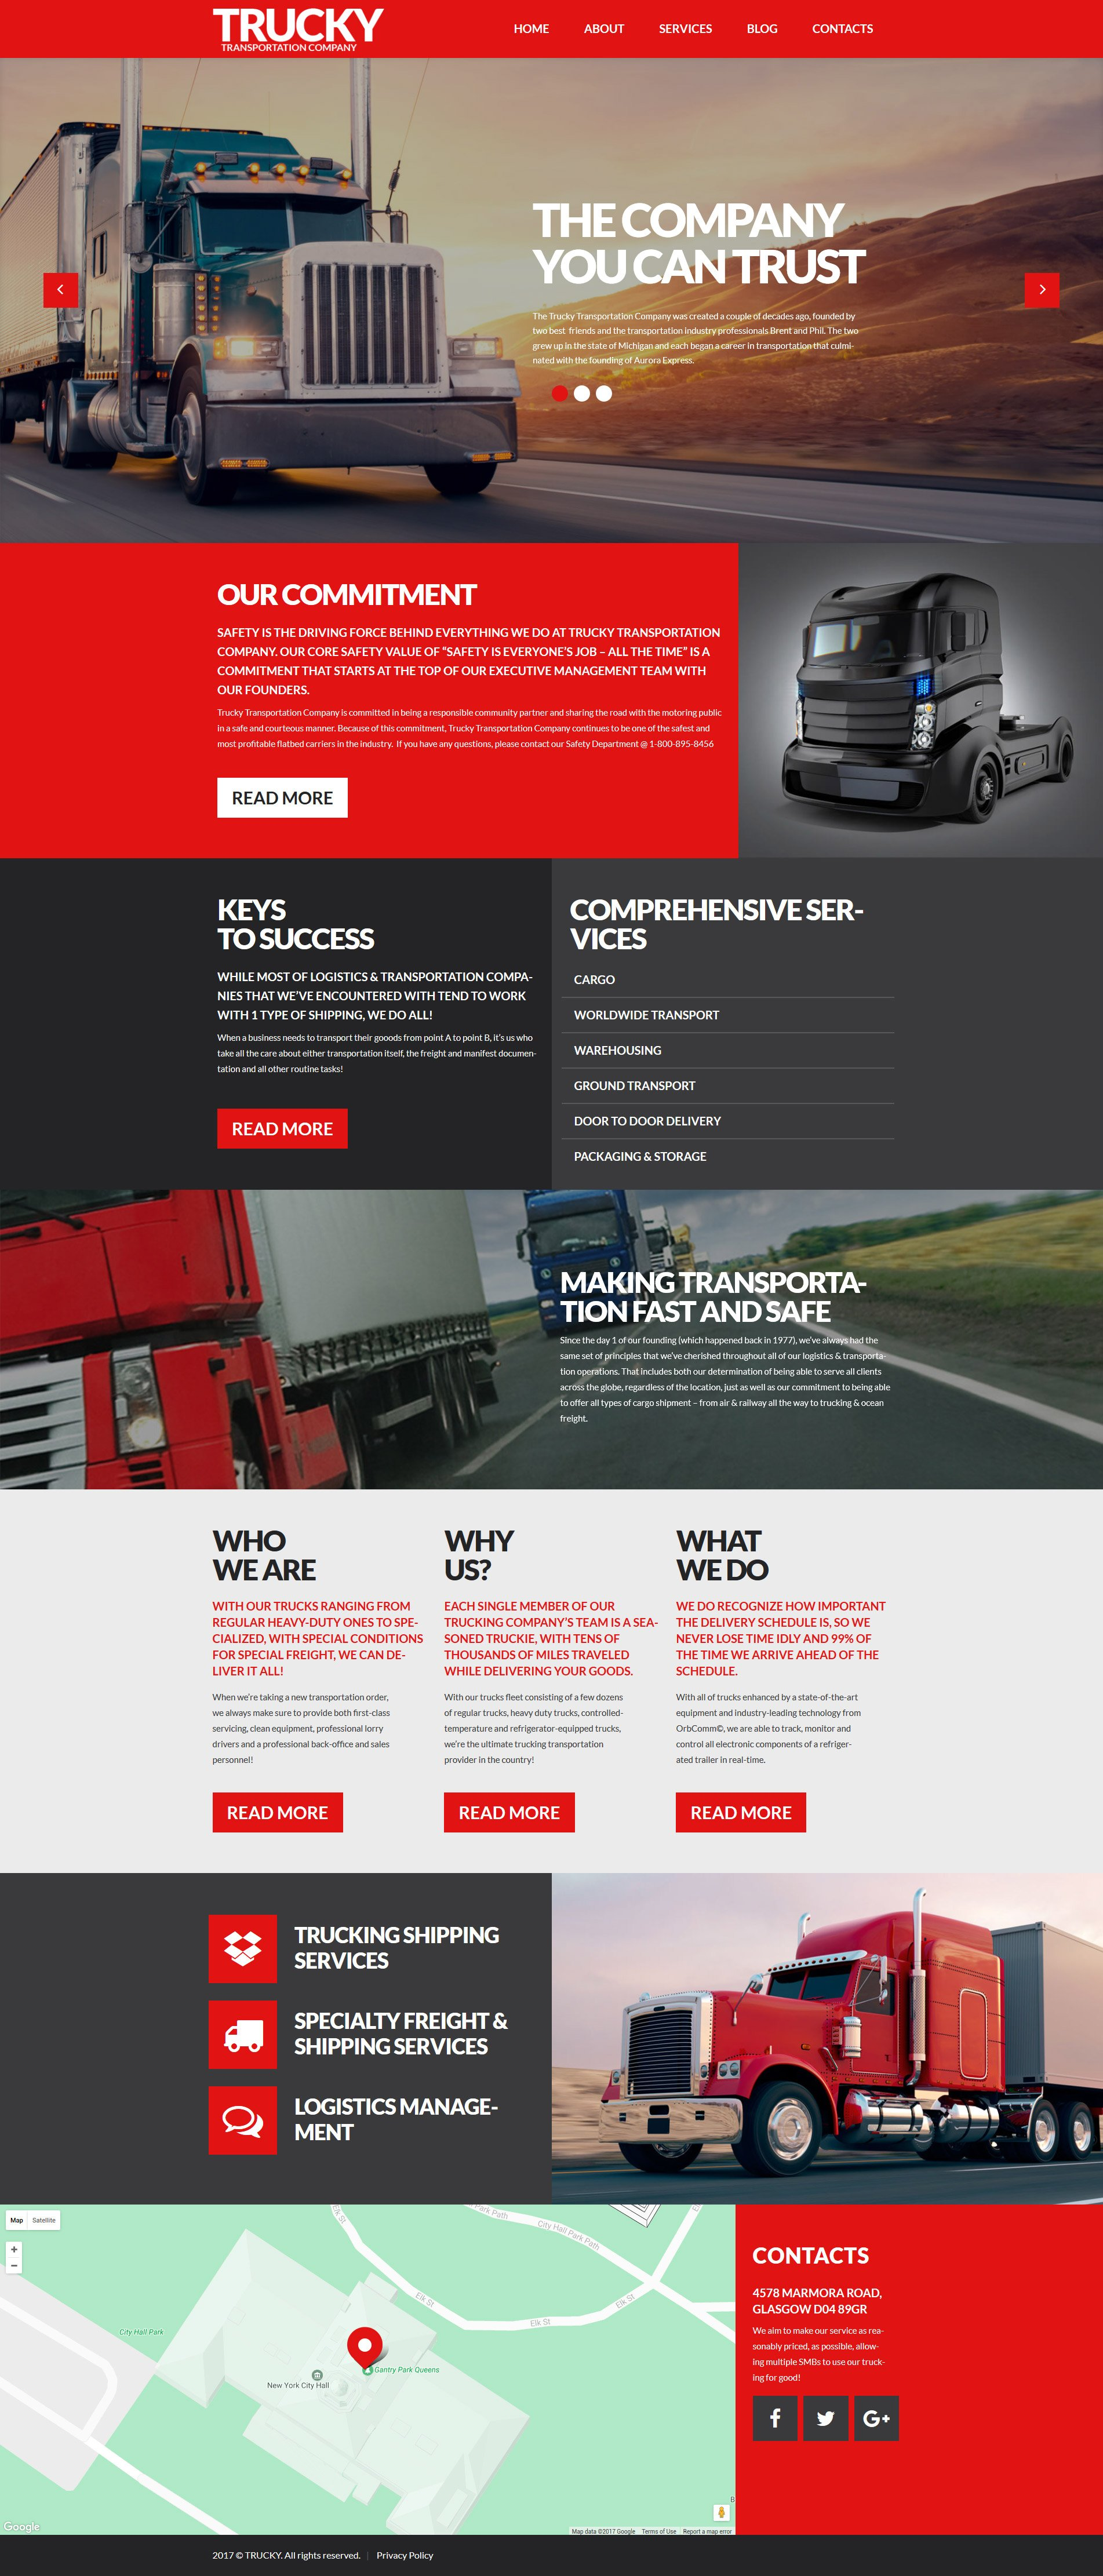 Responsive Trucky - Transportation & Logistics Responsive Wordpress #53388 - Ekran resmi